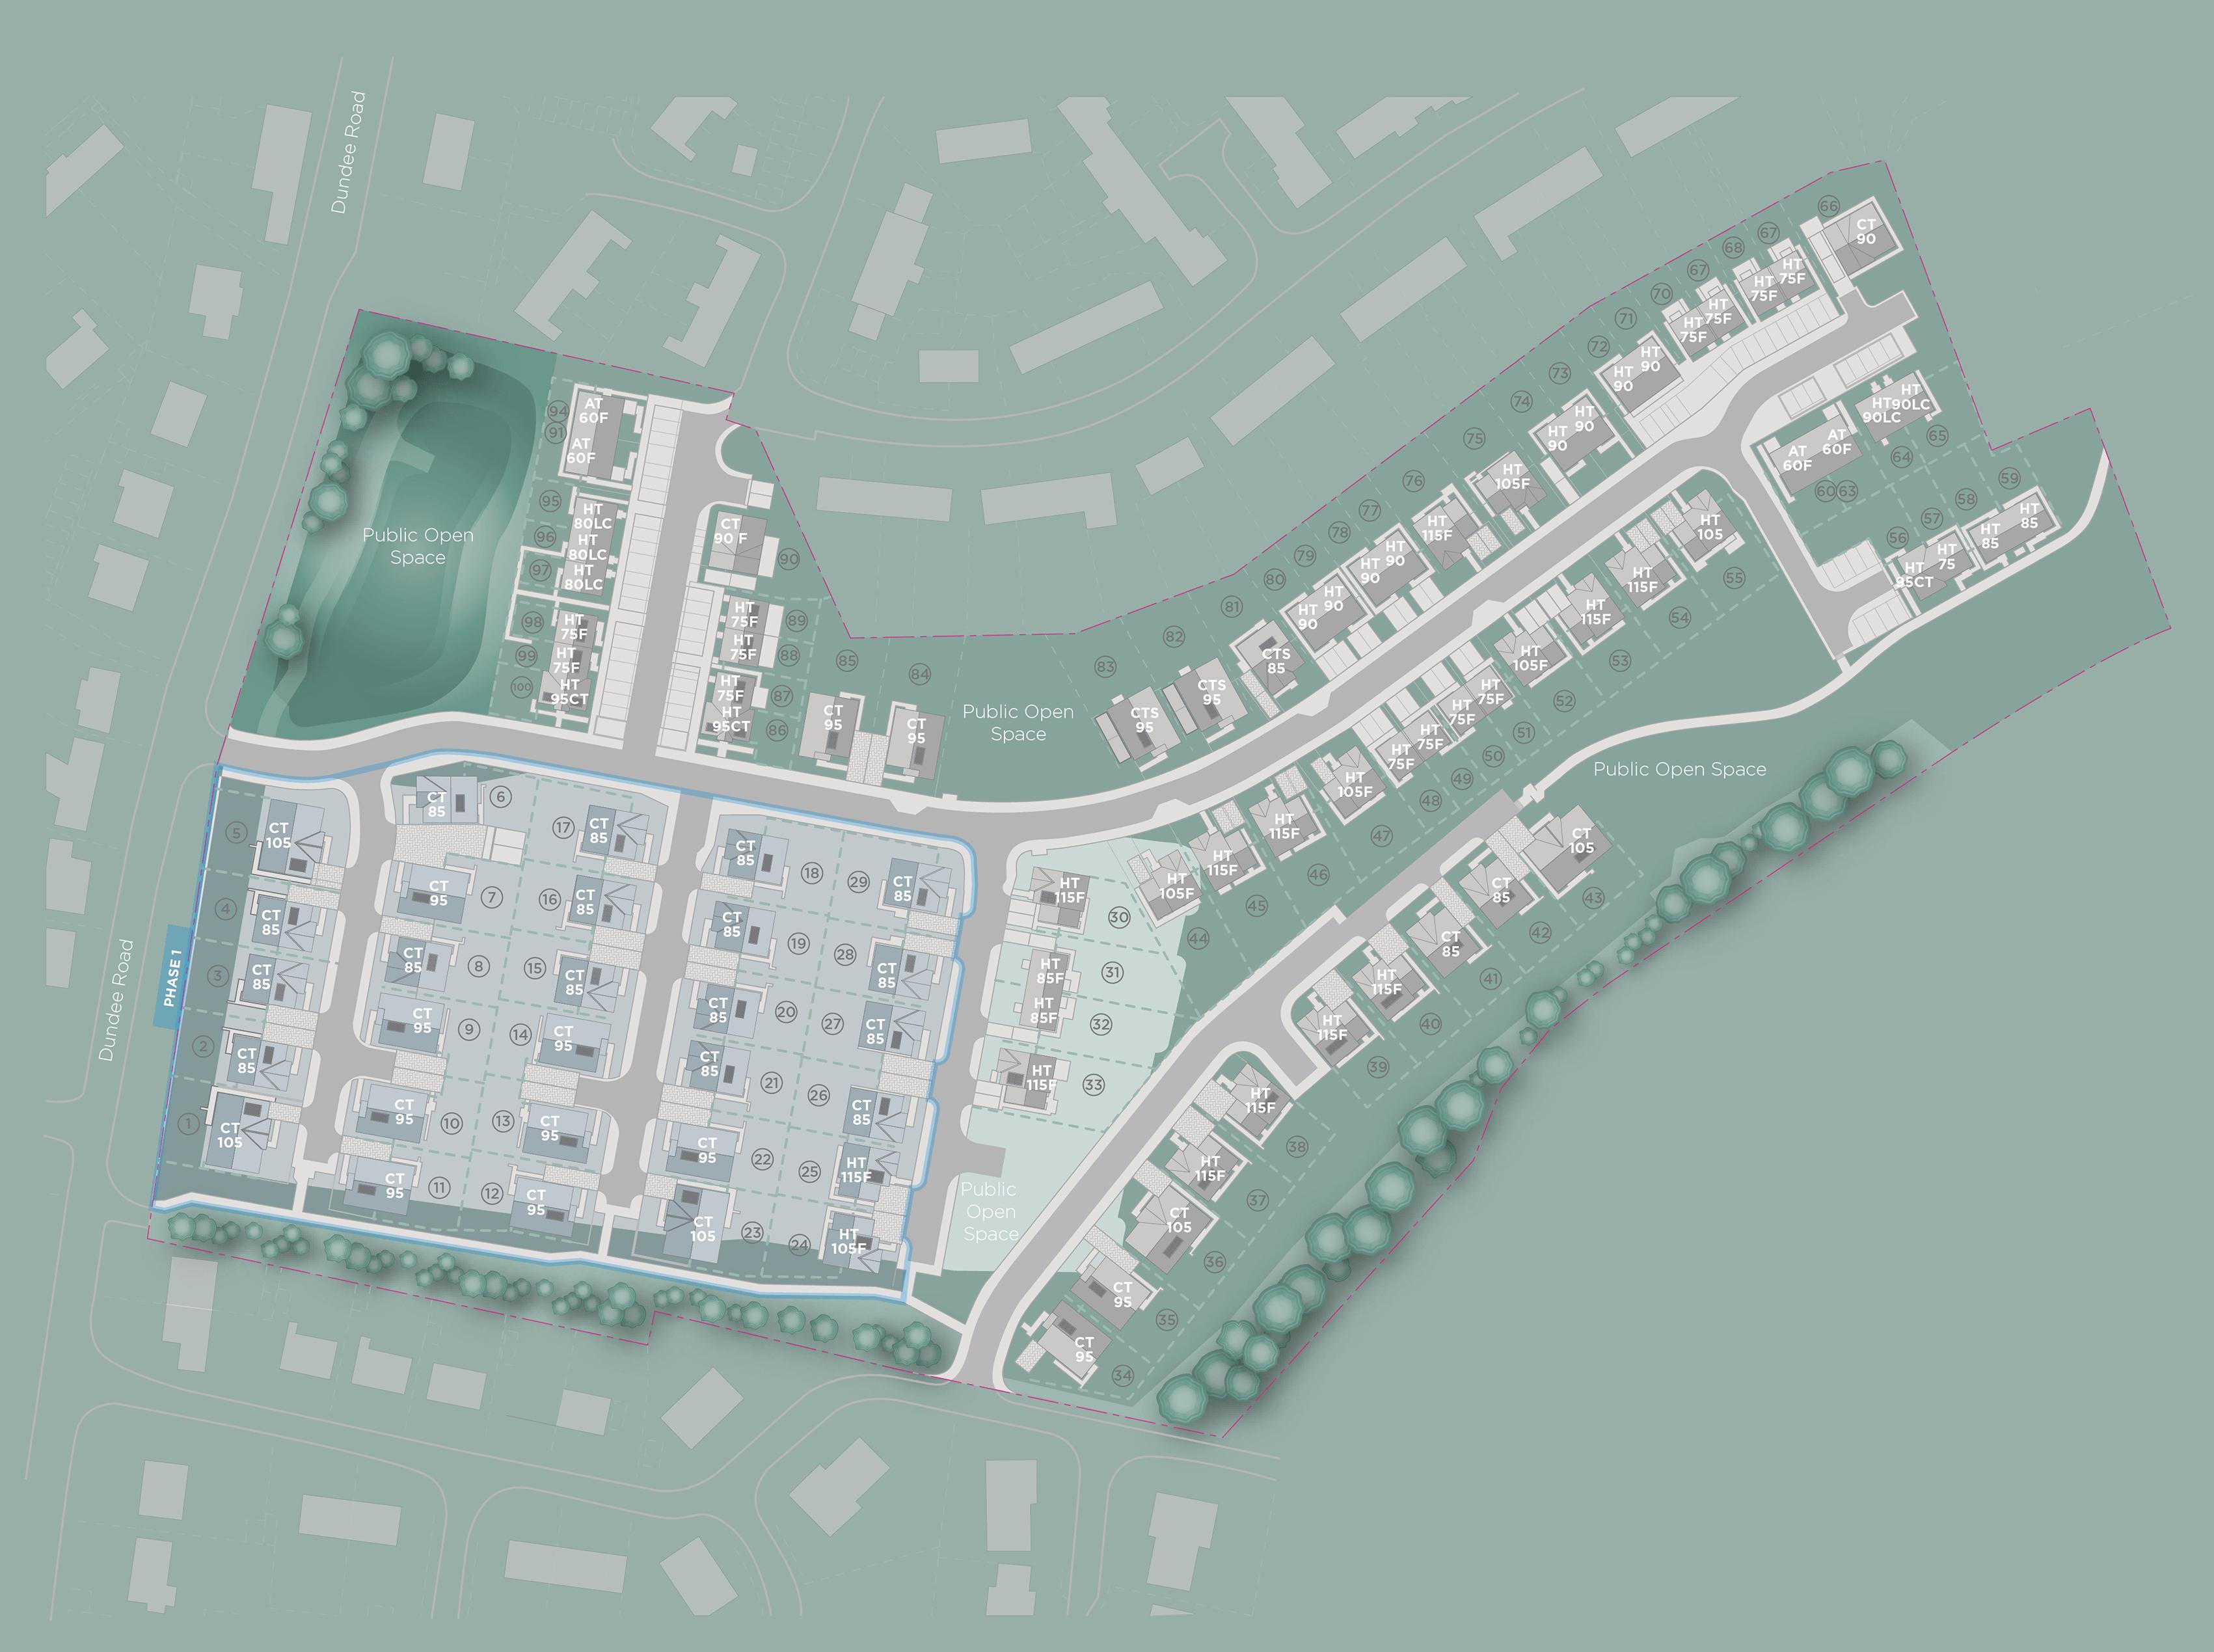 Siteplan, Glenview